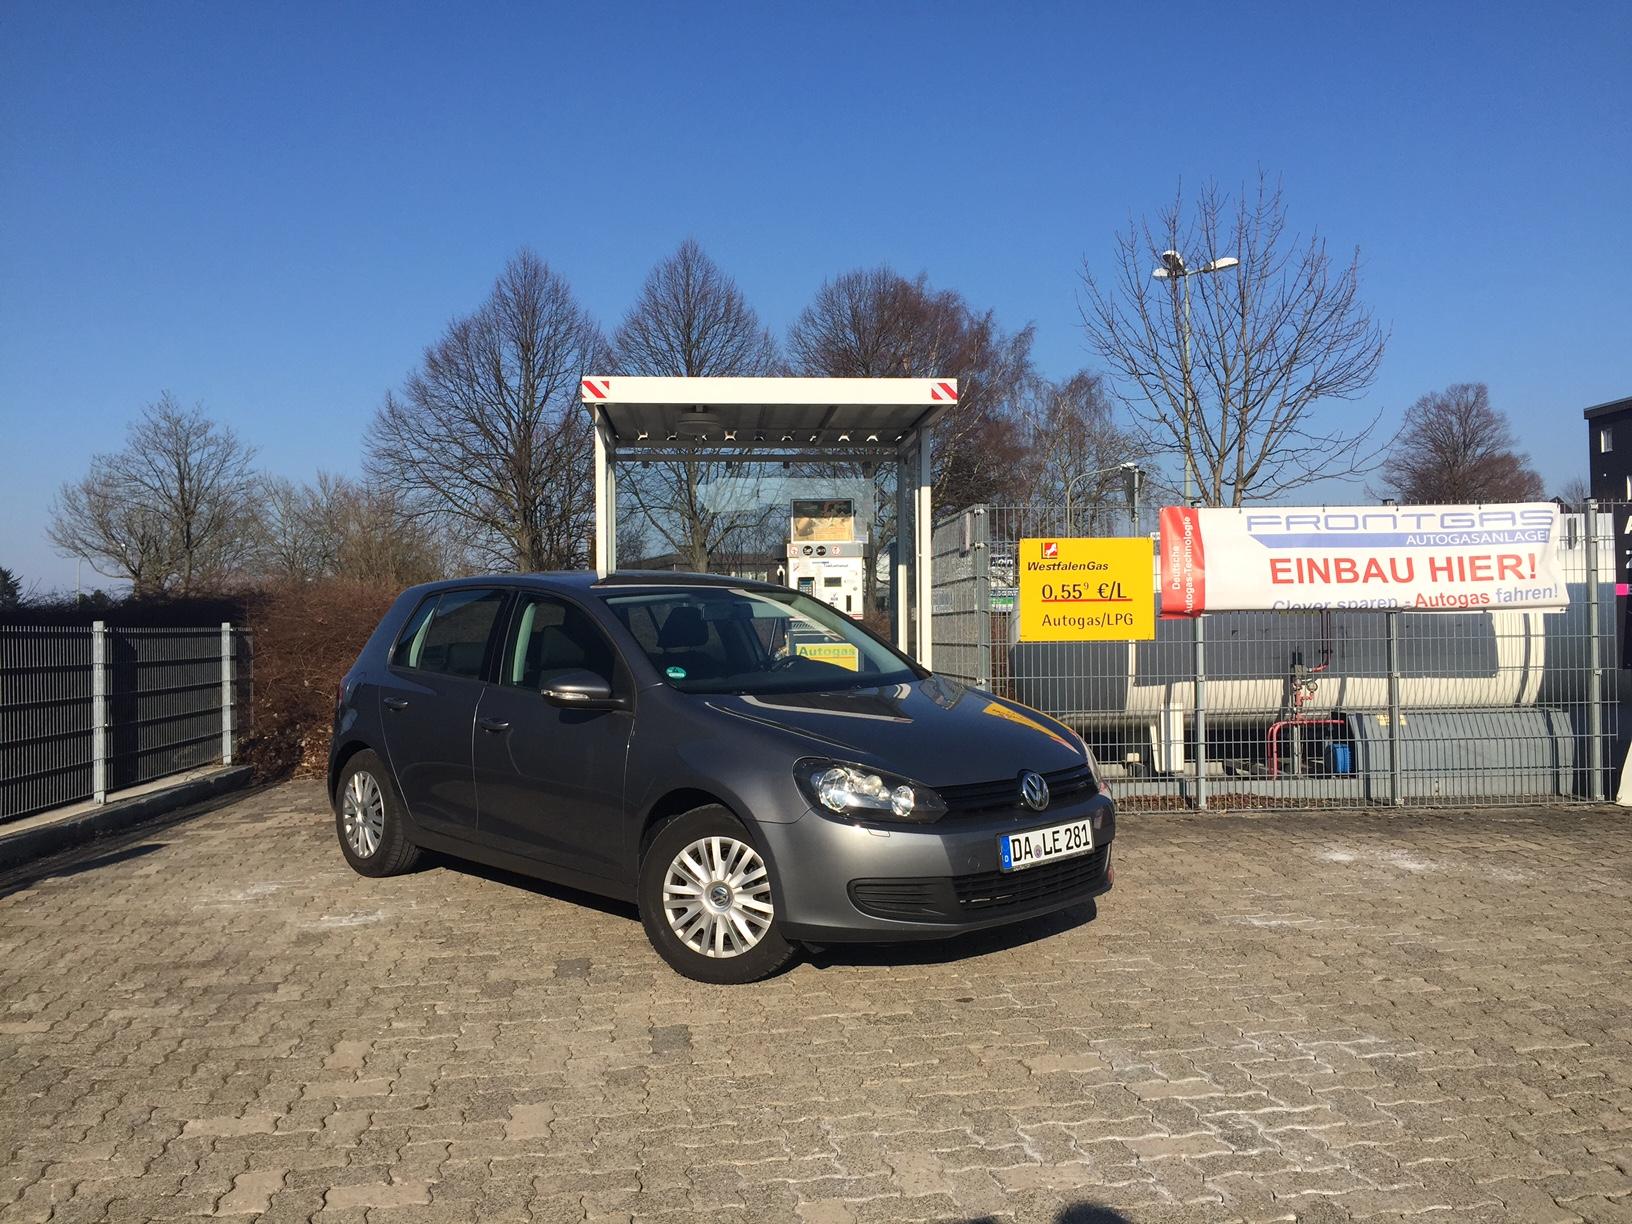 Autogas-Umrüstung-LPG-Frontgas-VW-Golf-6-1,4-59kw-5